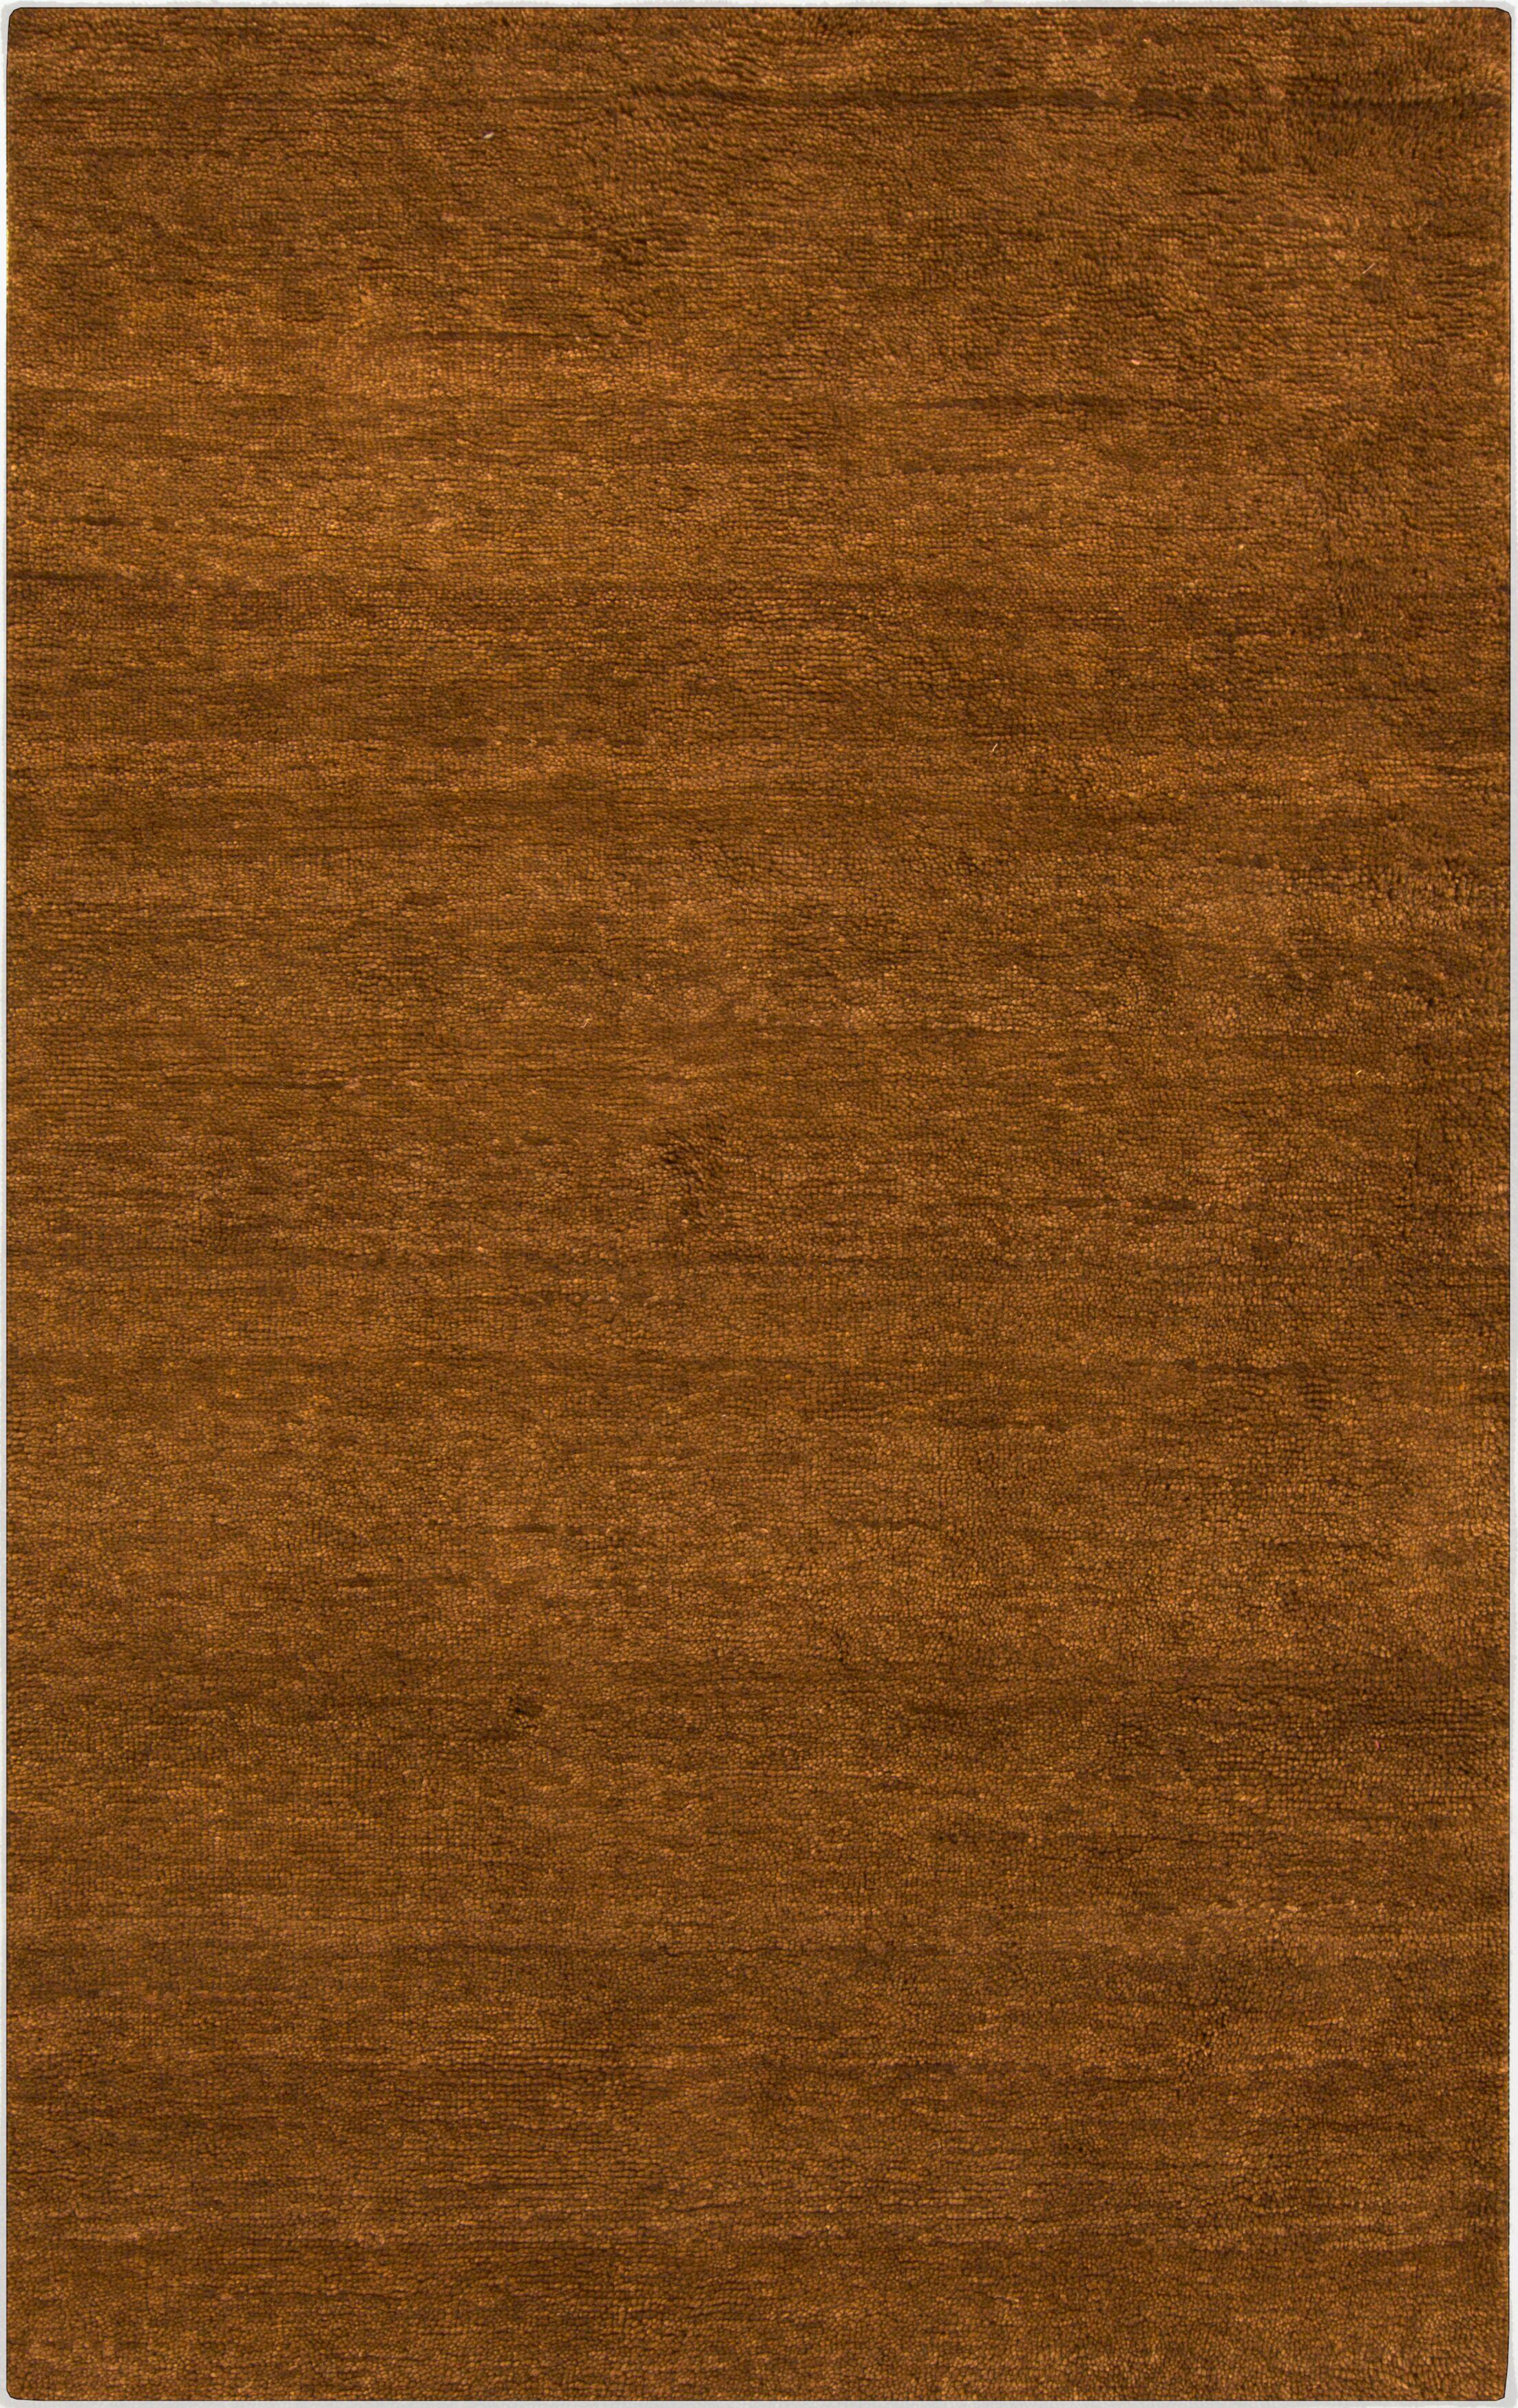 Beagle Burnt Orange Rug Rug Size: Rectangle 5' x 8'